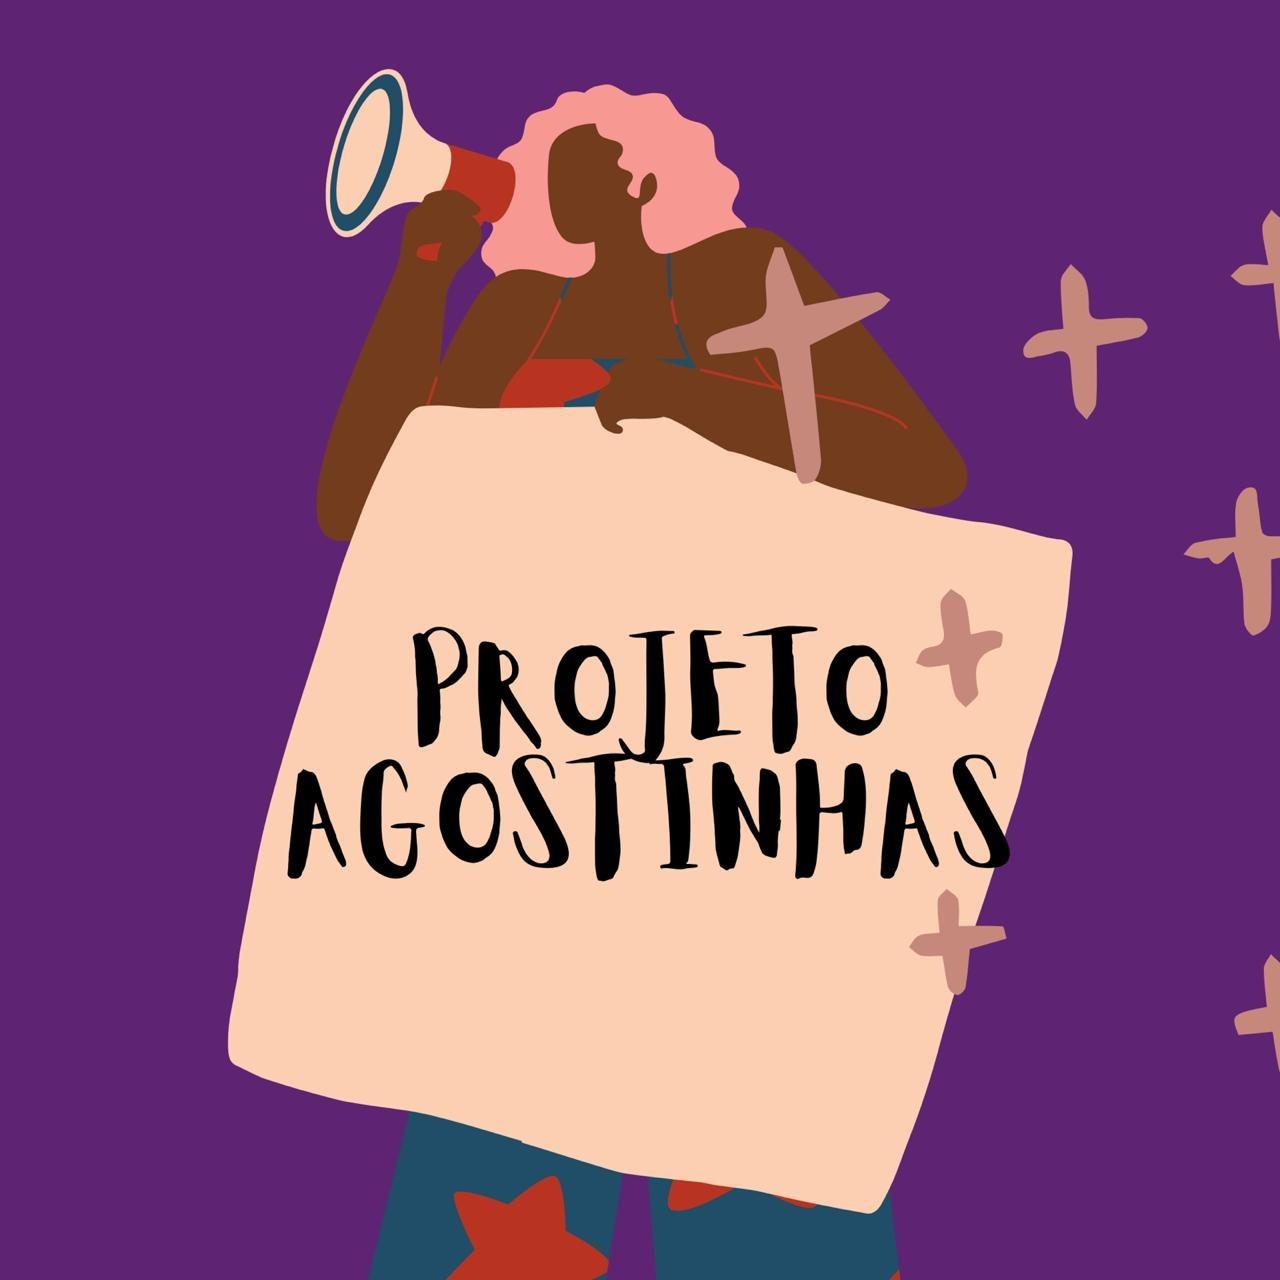 @projetoagostinhas Profile Image   Linktree